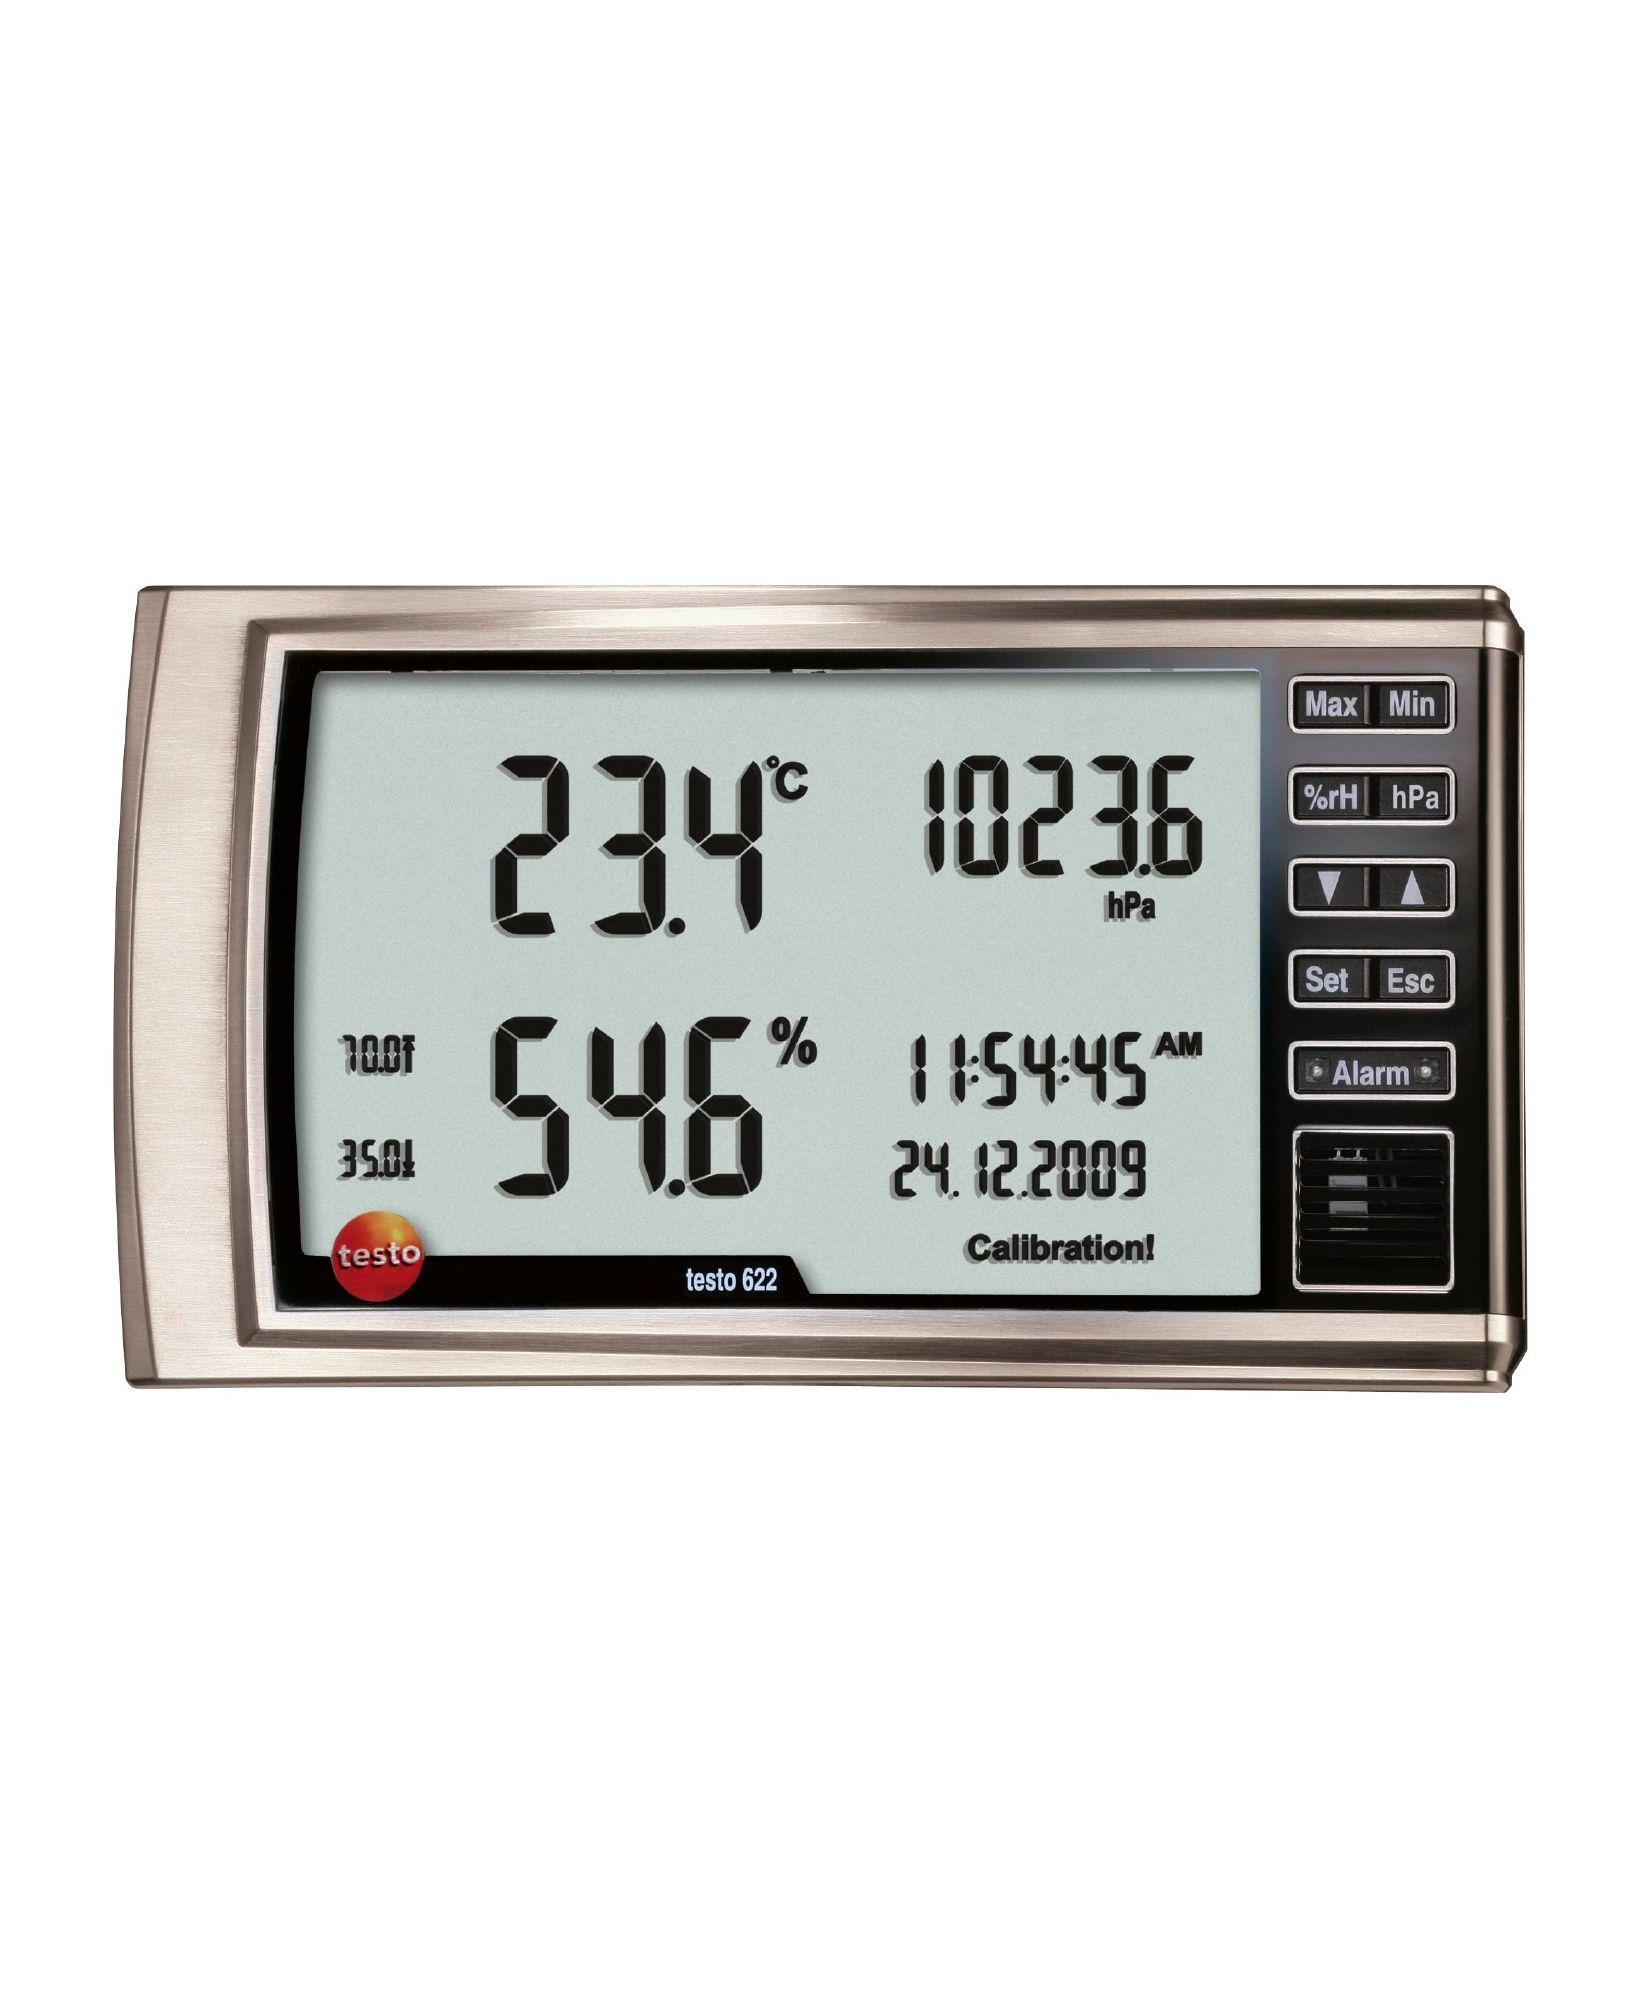 TESTO 622 - Thermohygrometer and Barometer